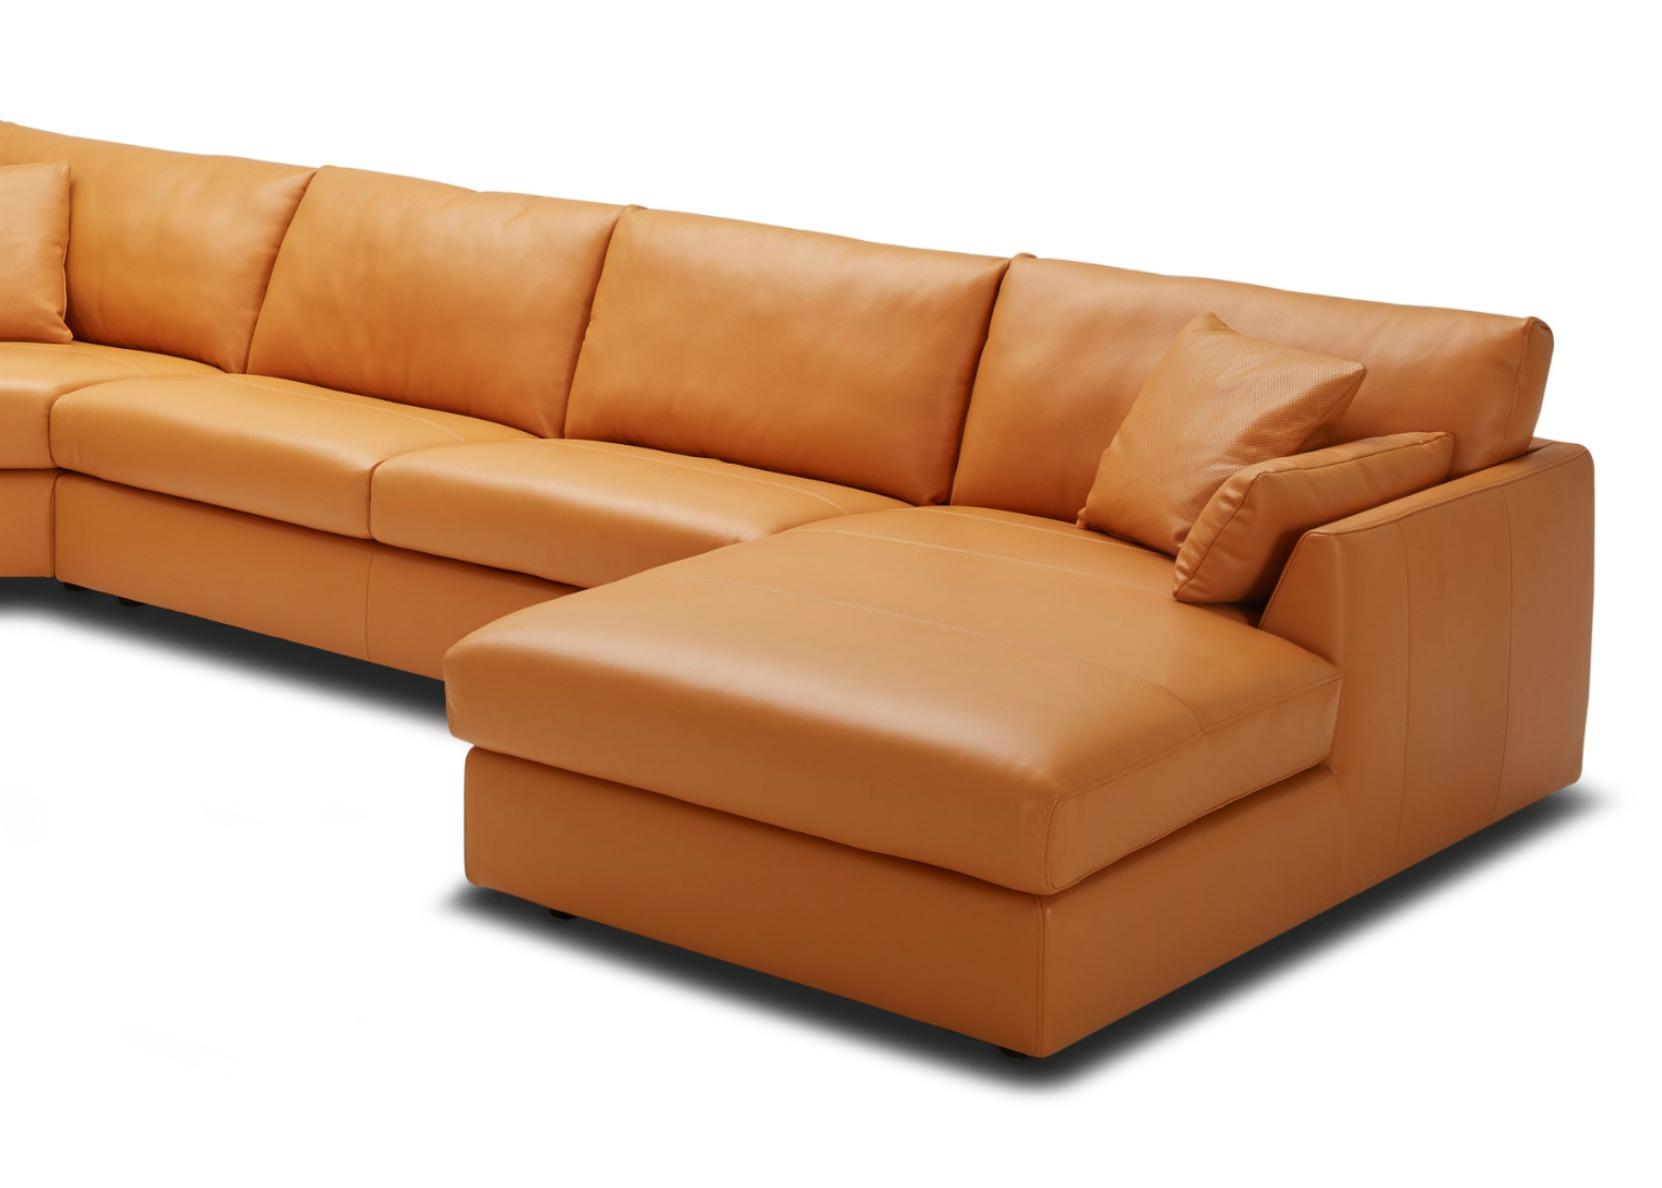 ... Tan Leather 5558 Sofa 00 ...